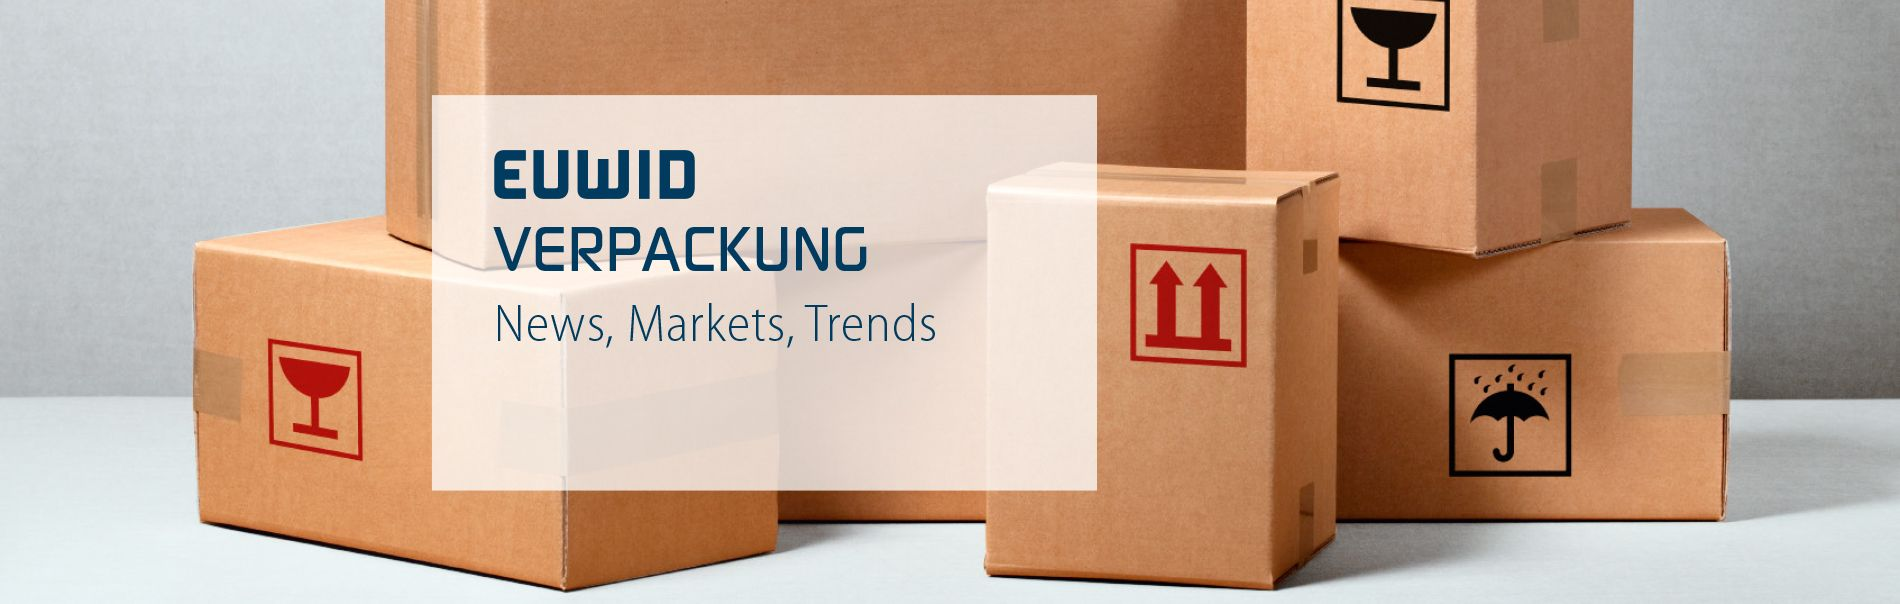 EUWID Verpackung packaging englisch